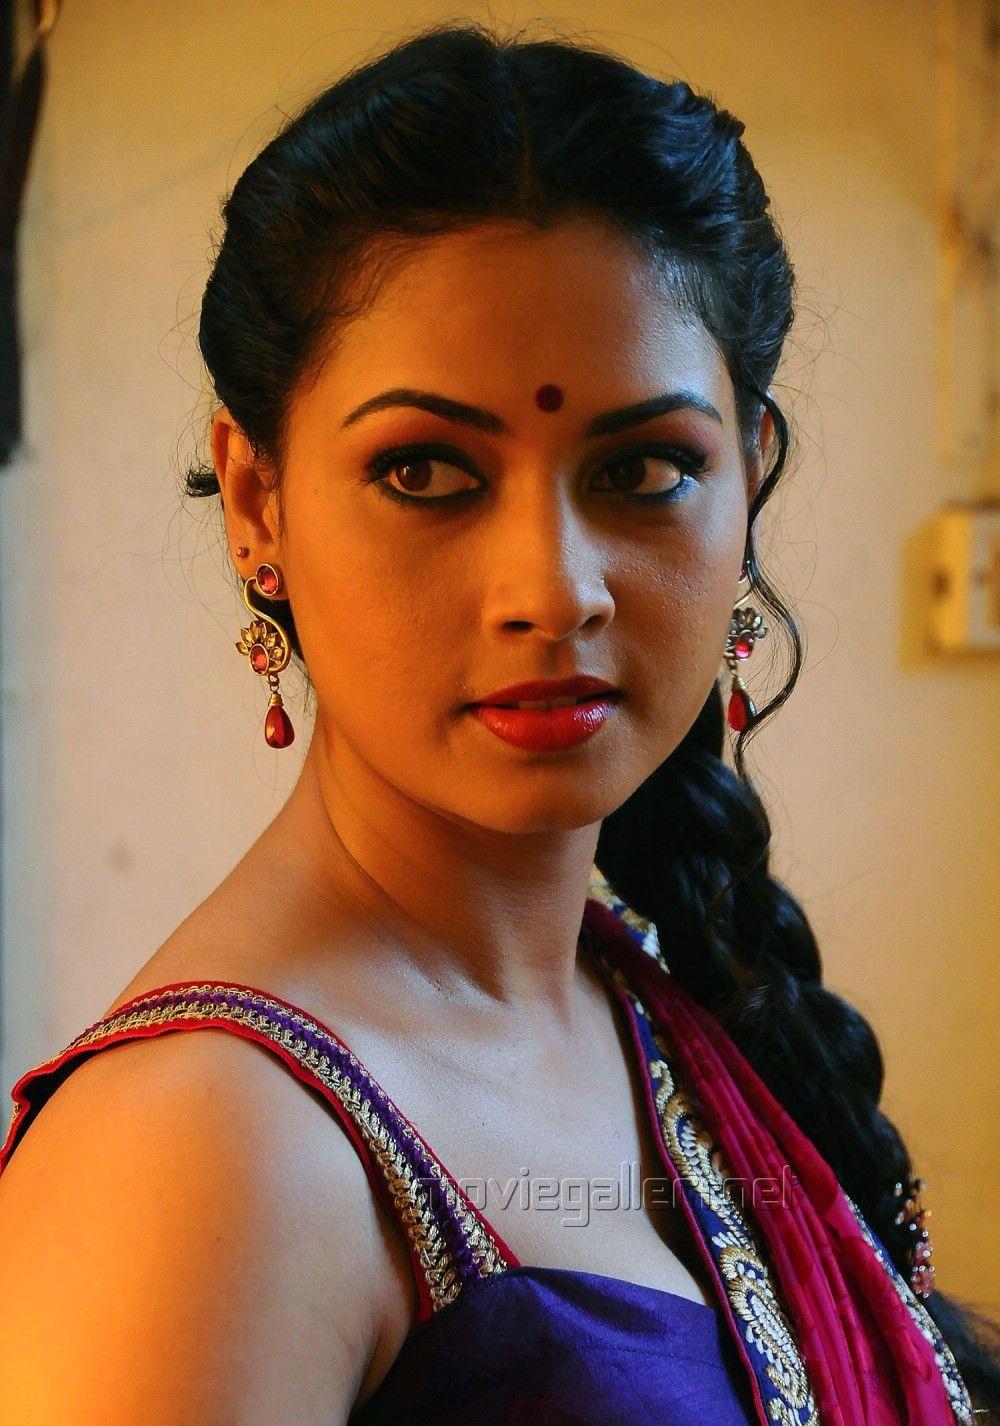 Watch Pooja Umashankar video